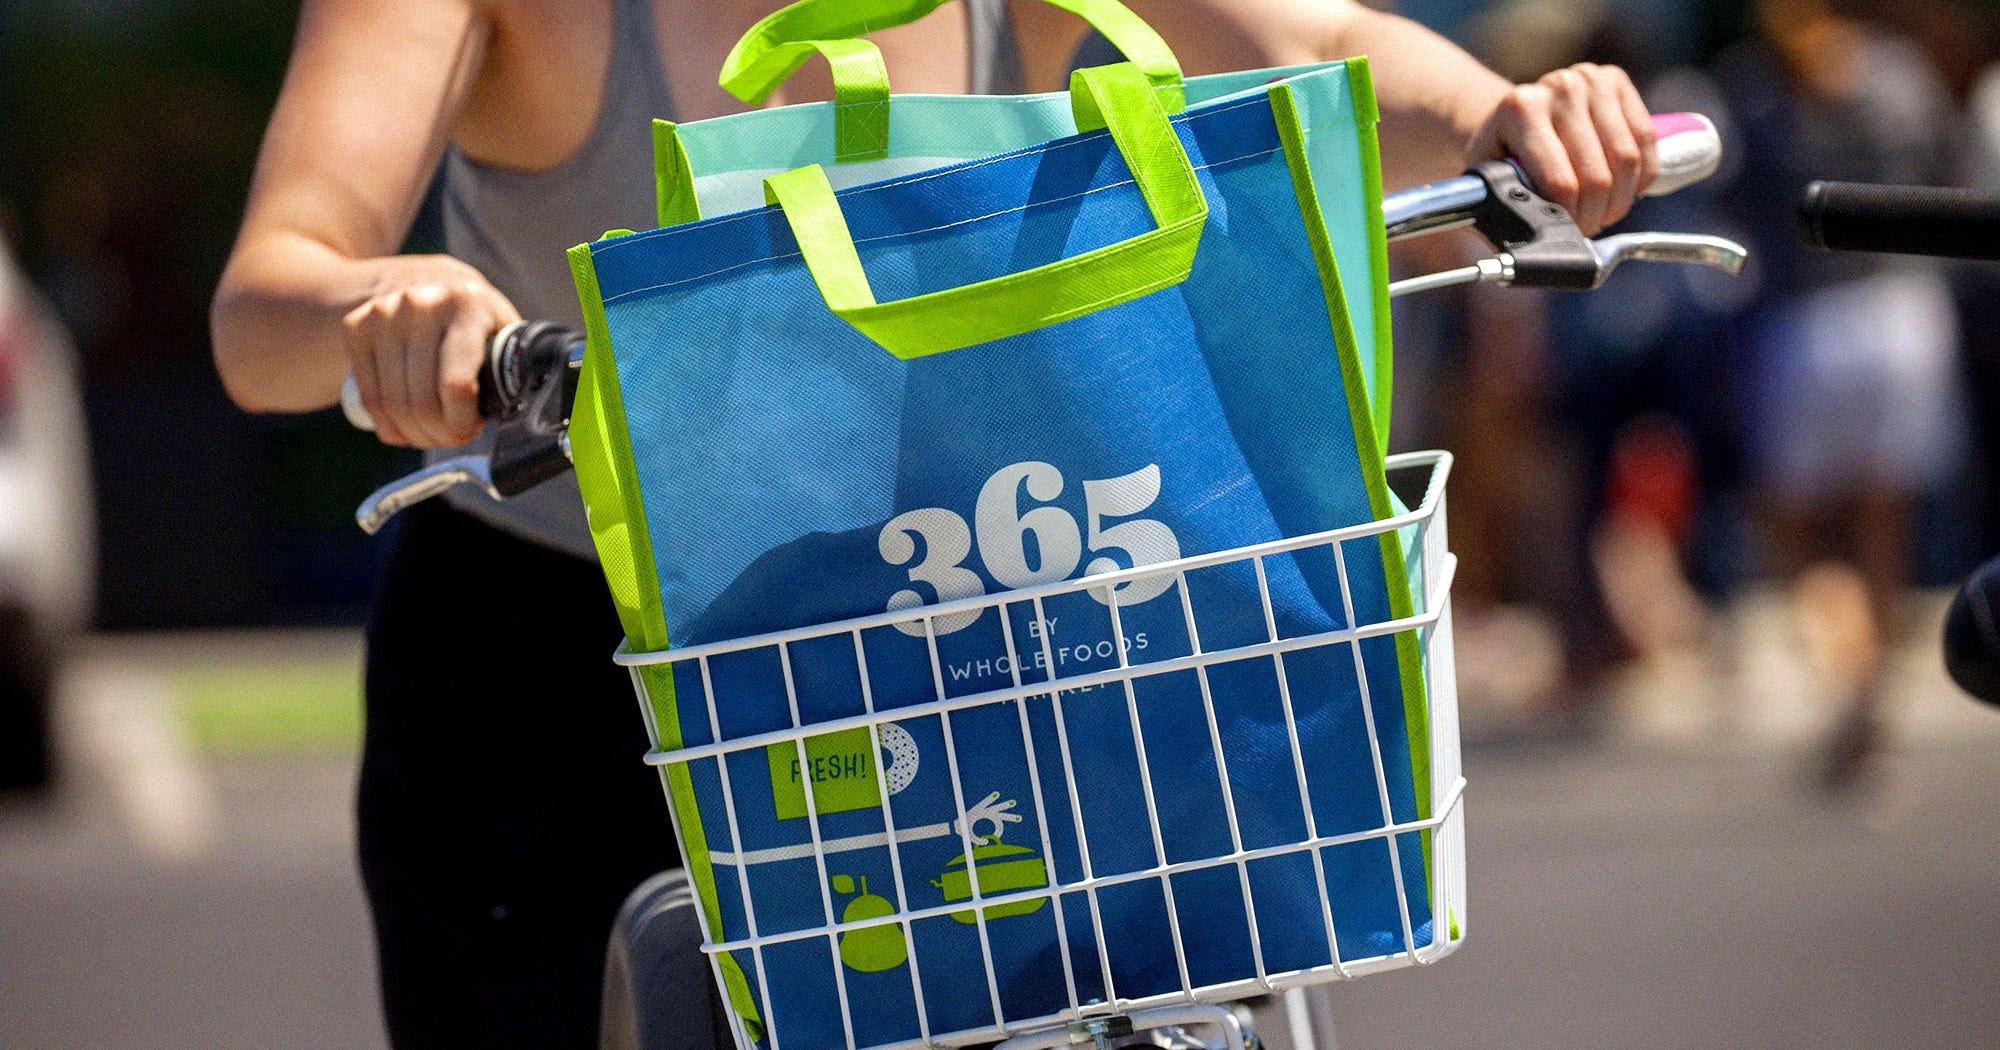 Whole Foods Market 365 East Coast Location Opening